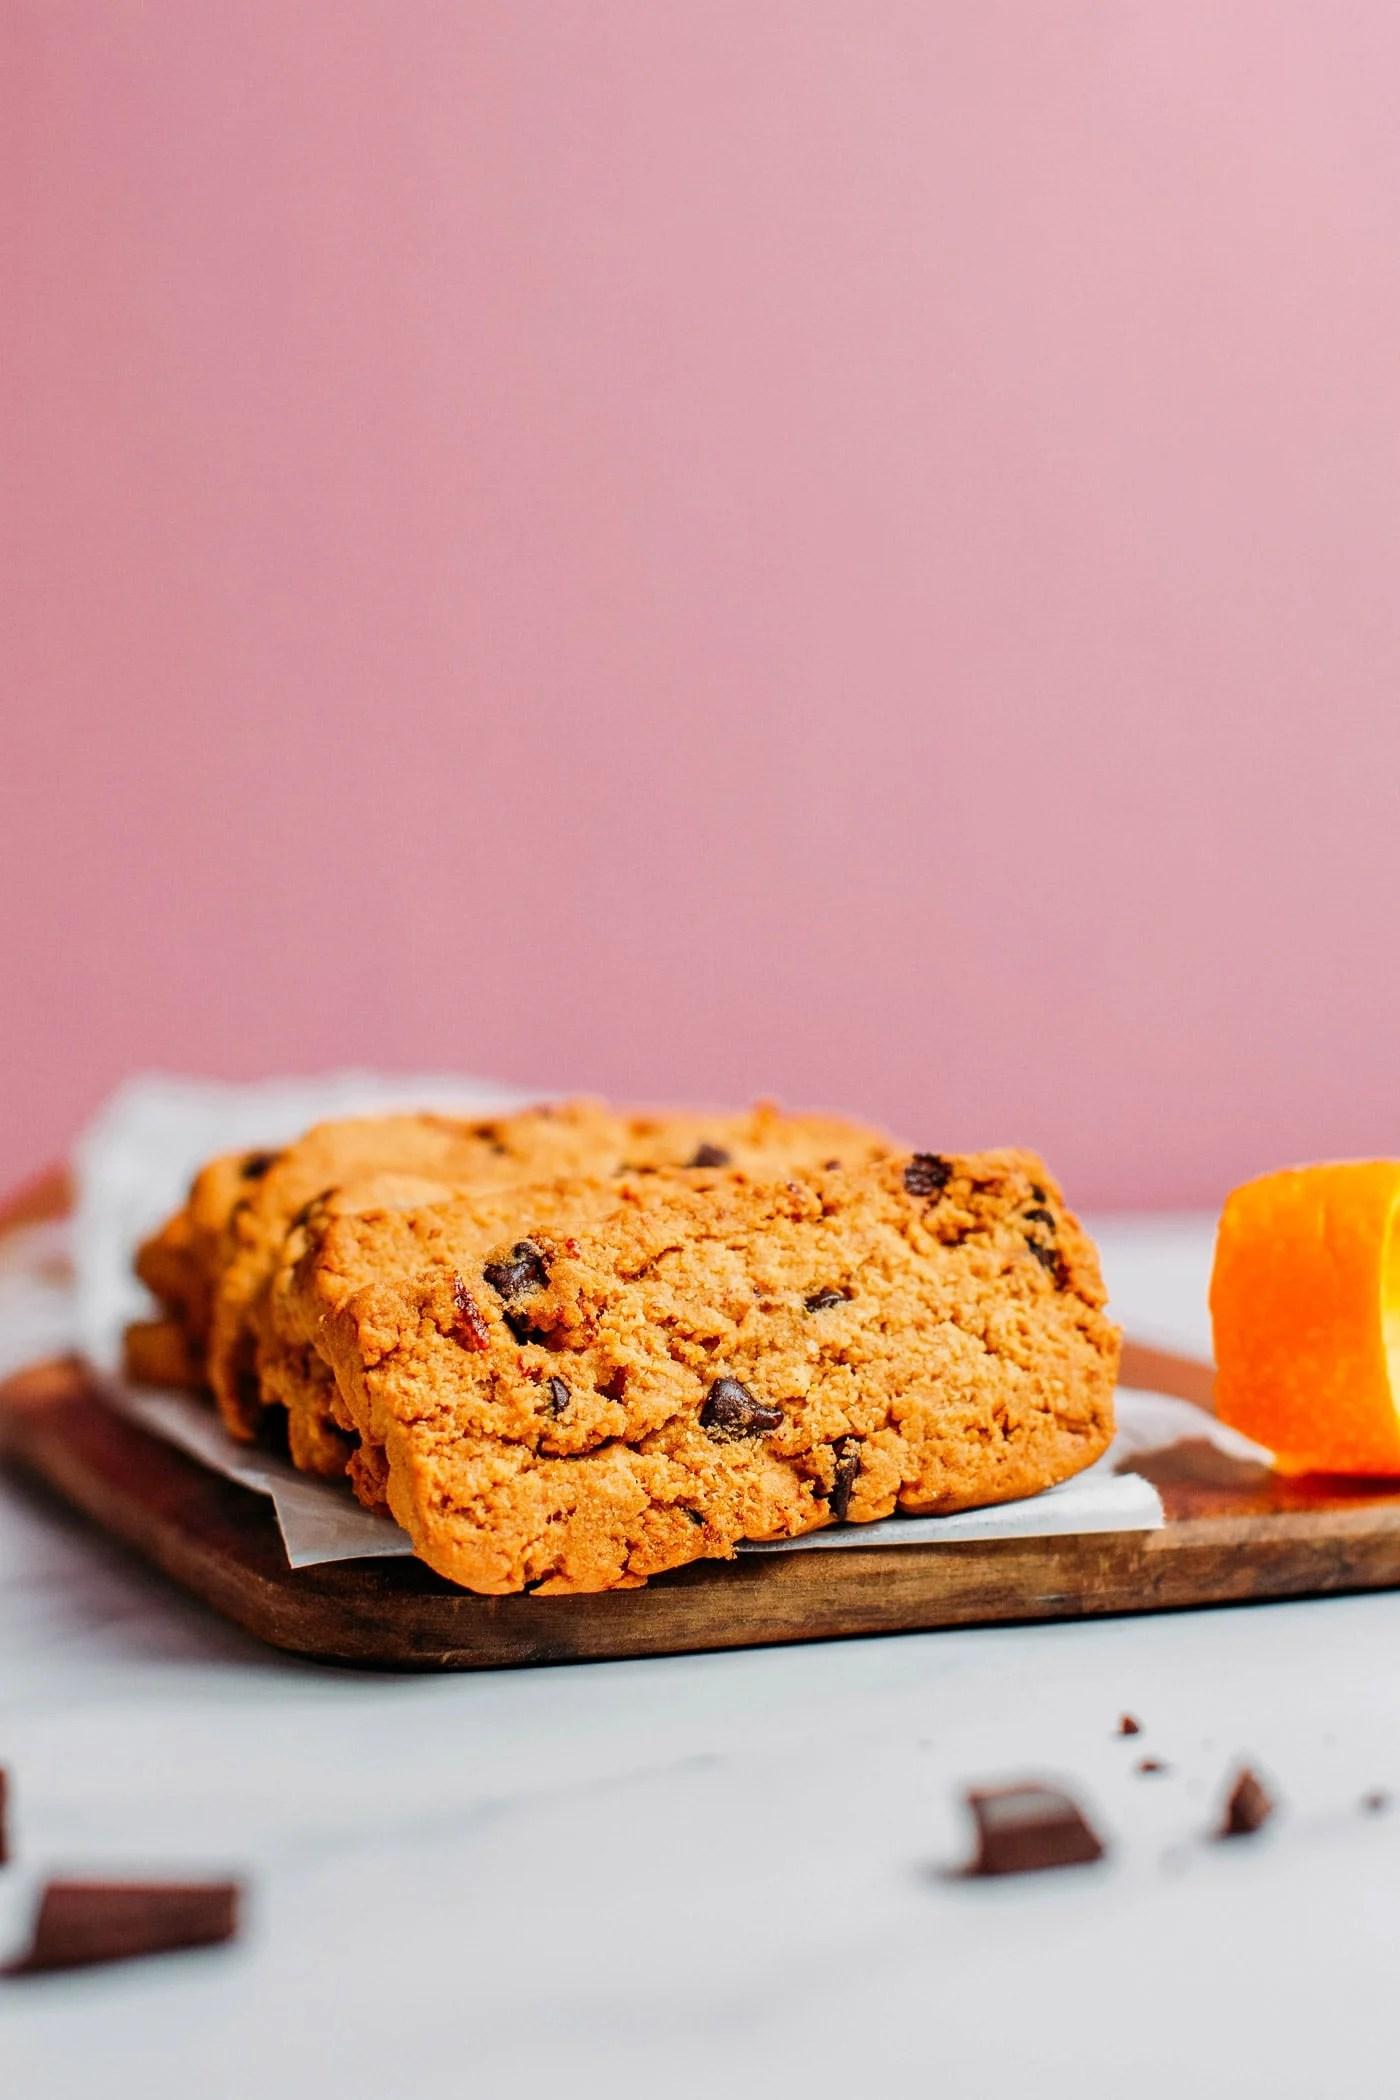 Chocolate Chip Orange Shortbread Cookies (Vegan + GF)